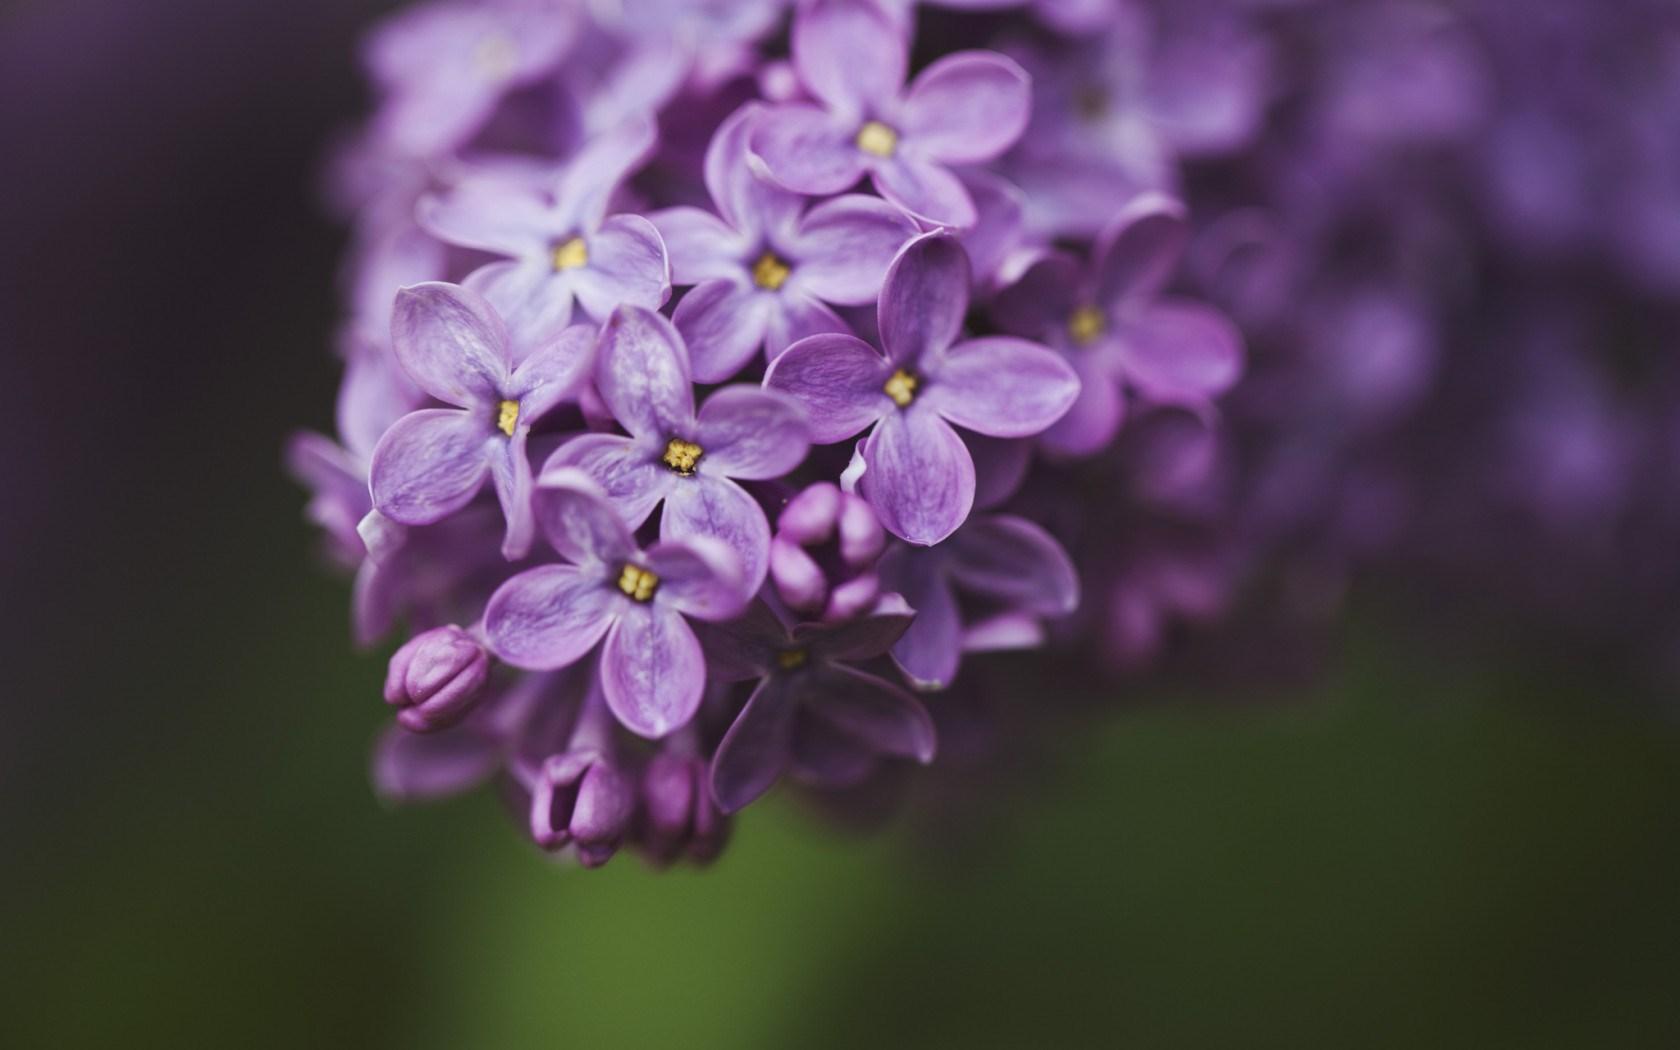 lilac flowers macro